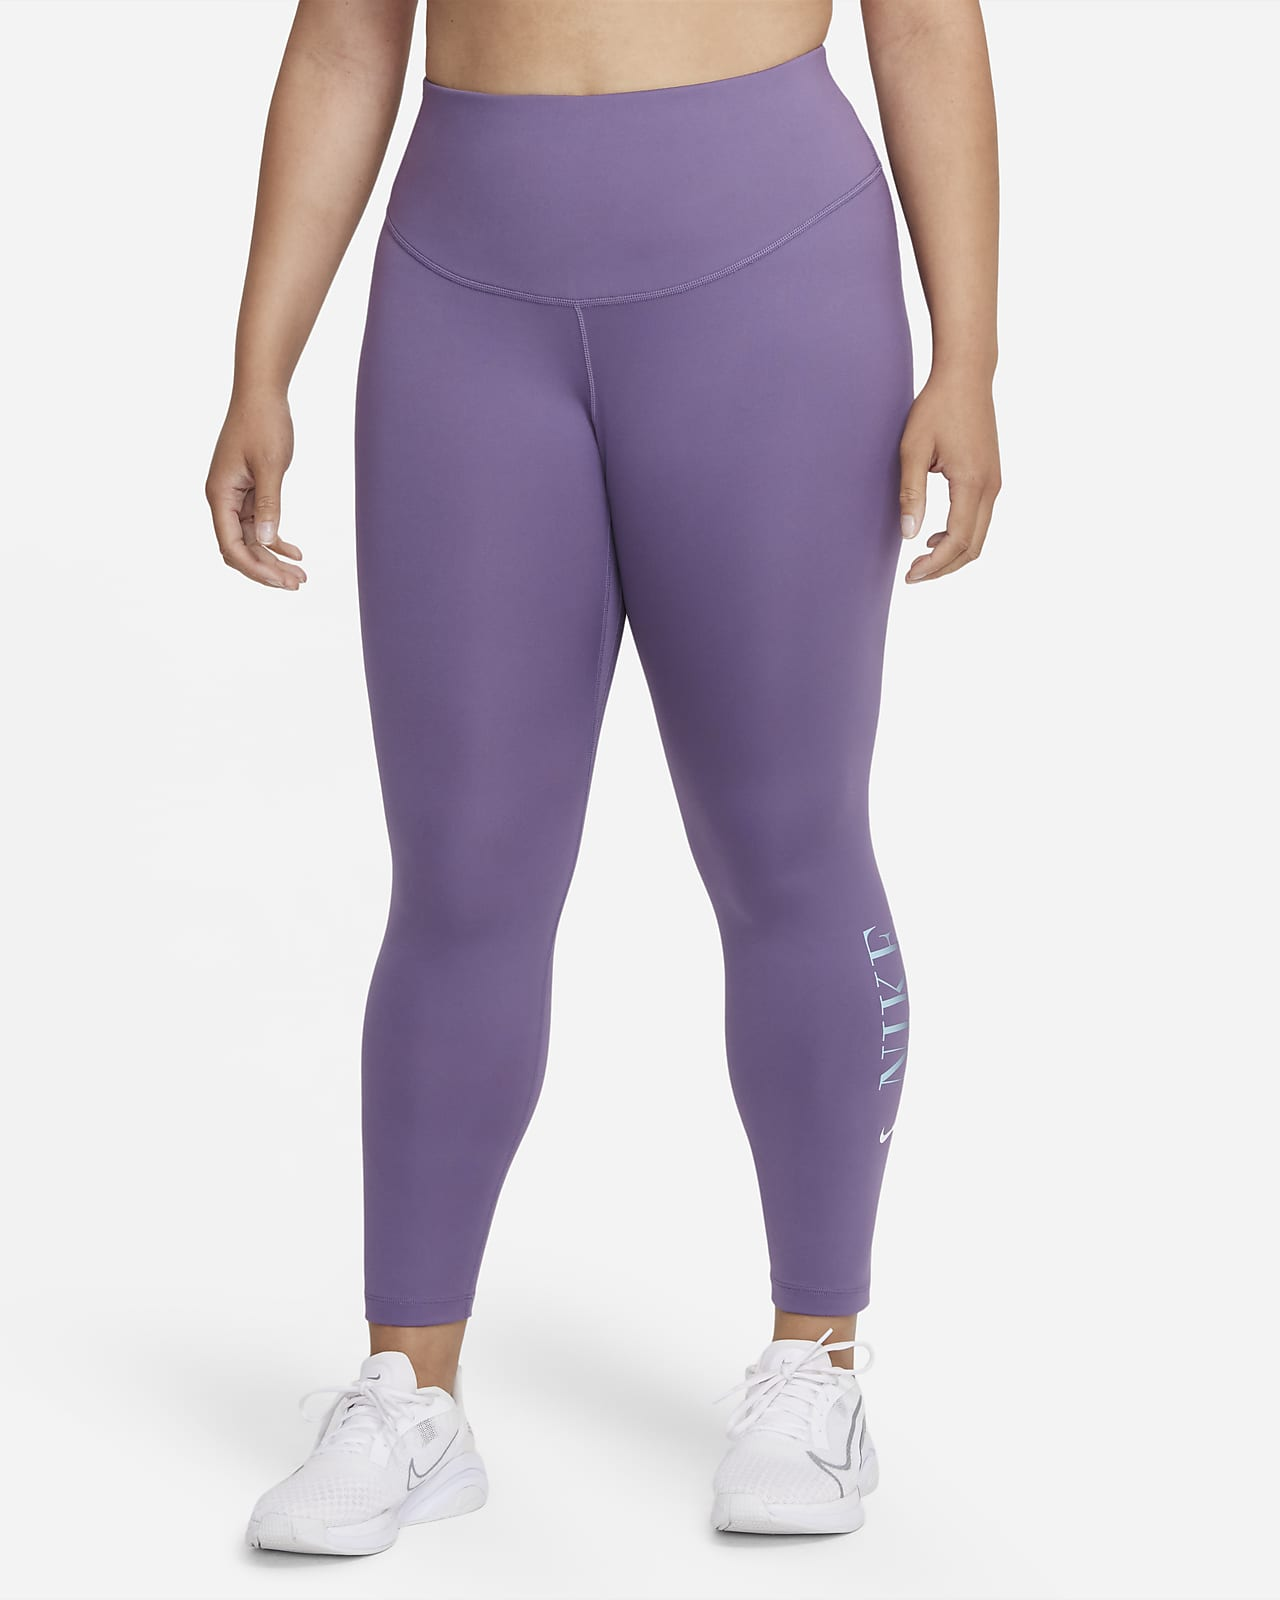 Nike Dri-FIT One Women's Mid-Rise 7/8 Graphic Leggings (Plus Size)